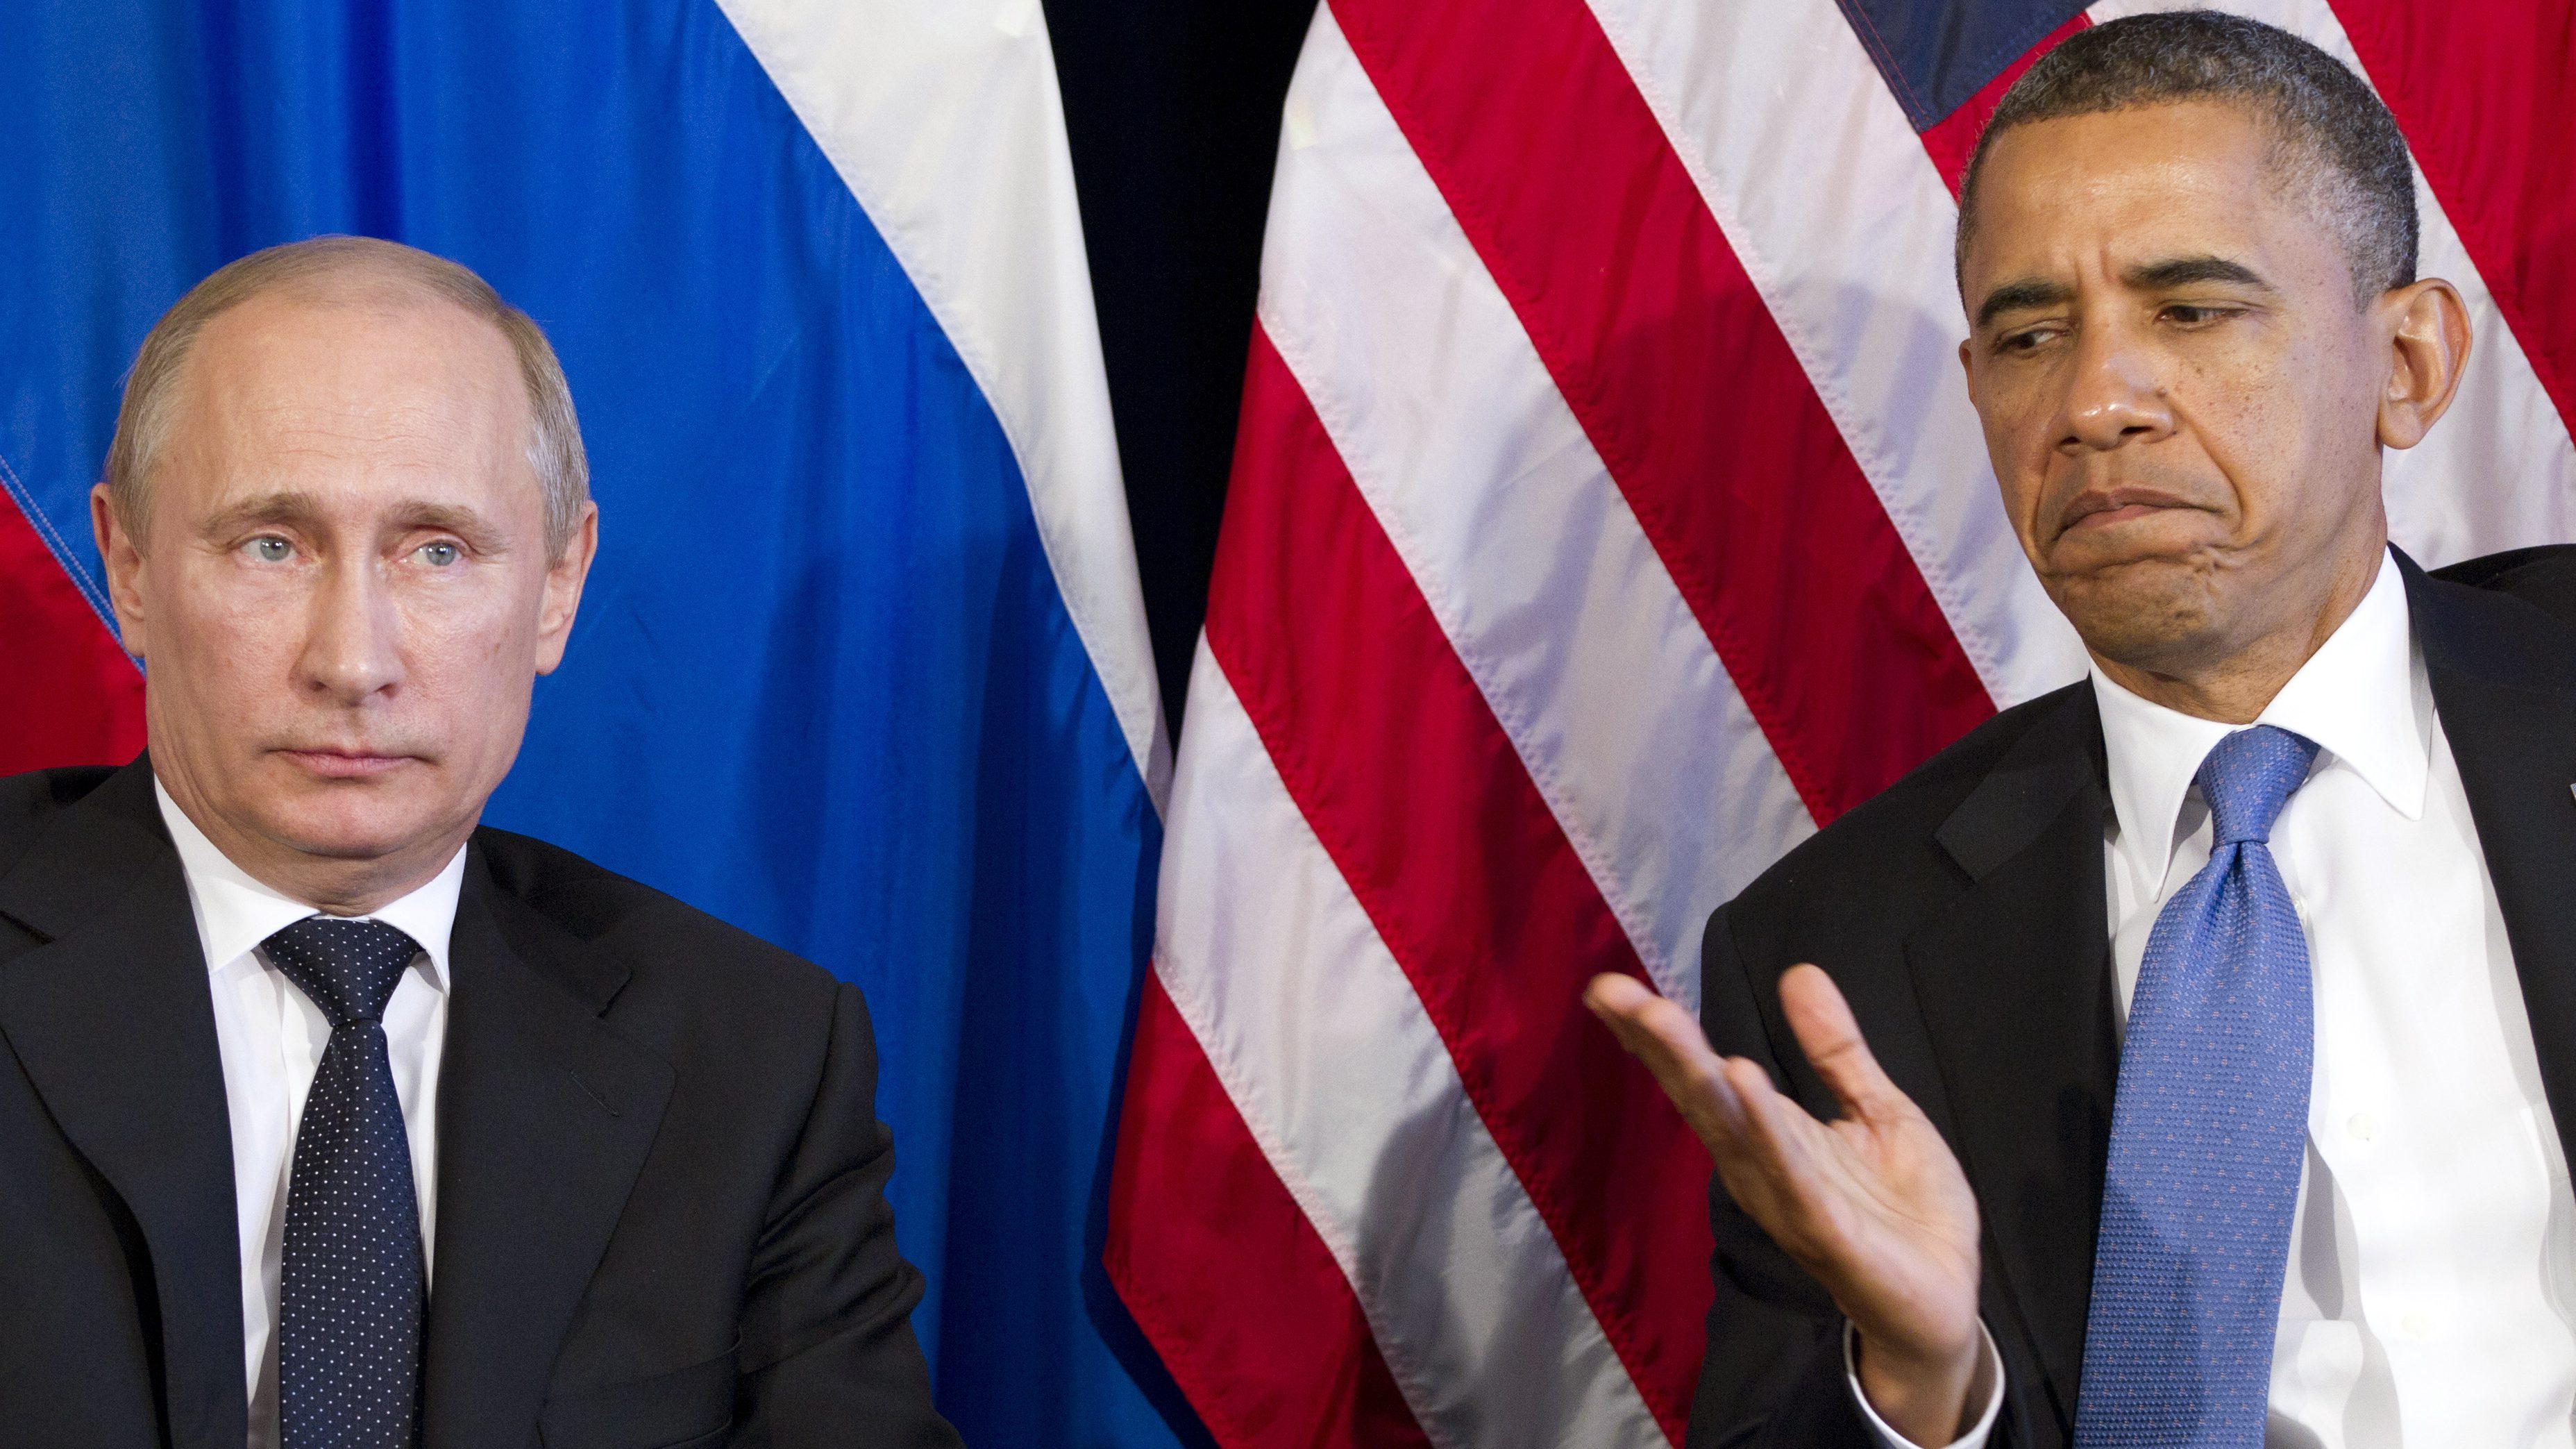 Putin and Trump call each other Vladimir and Barack